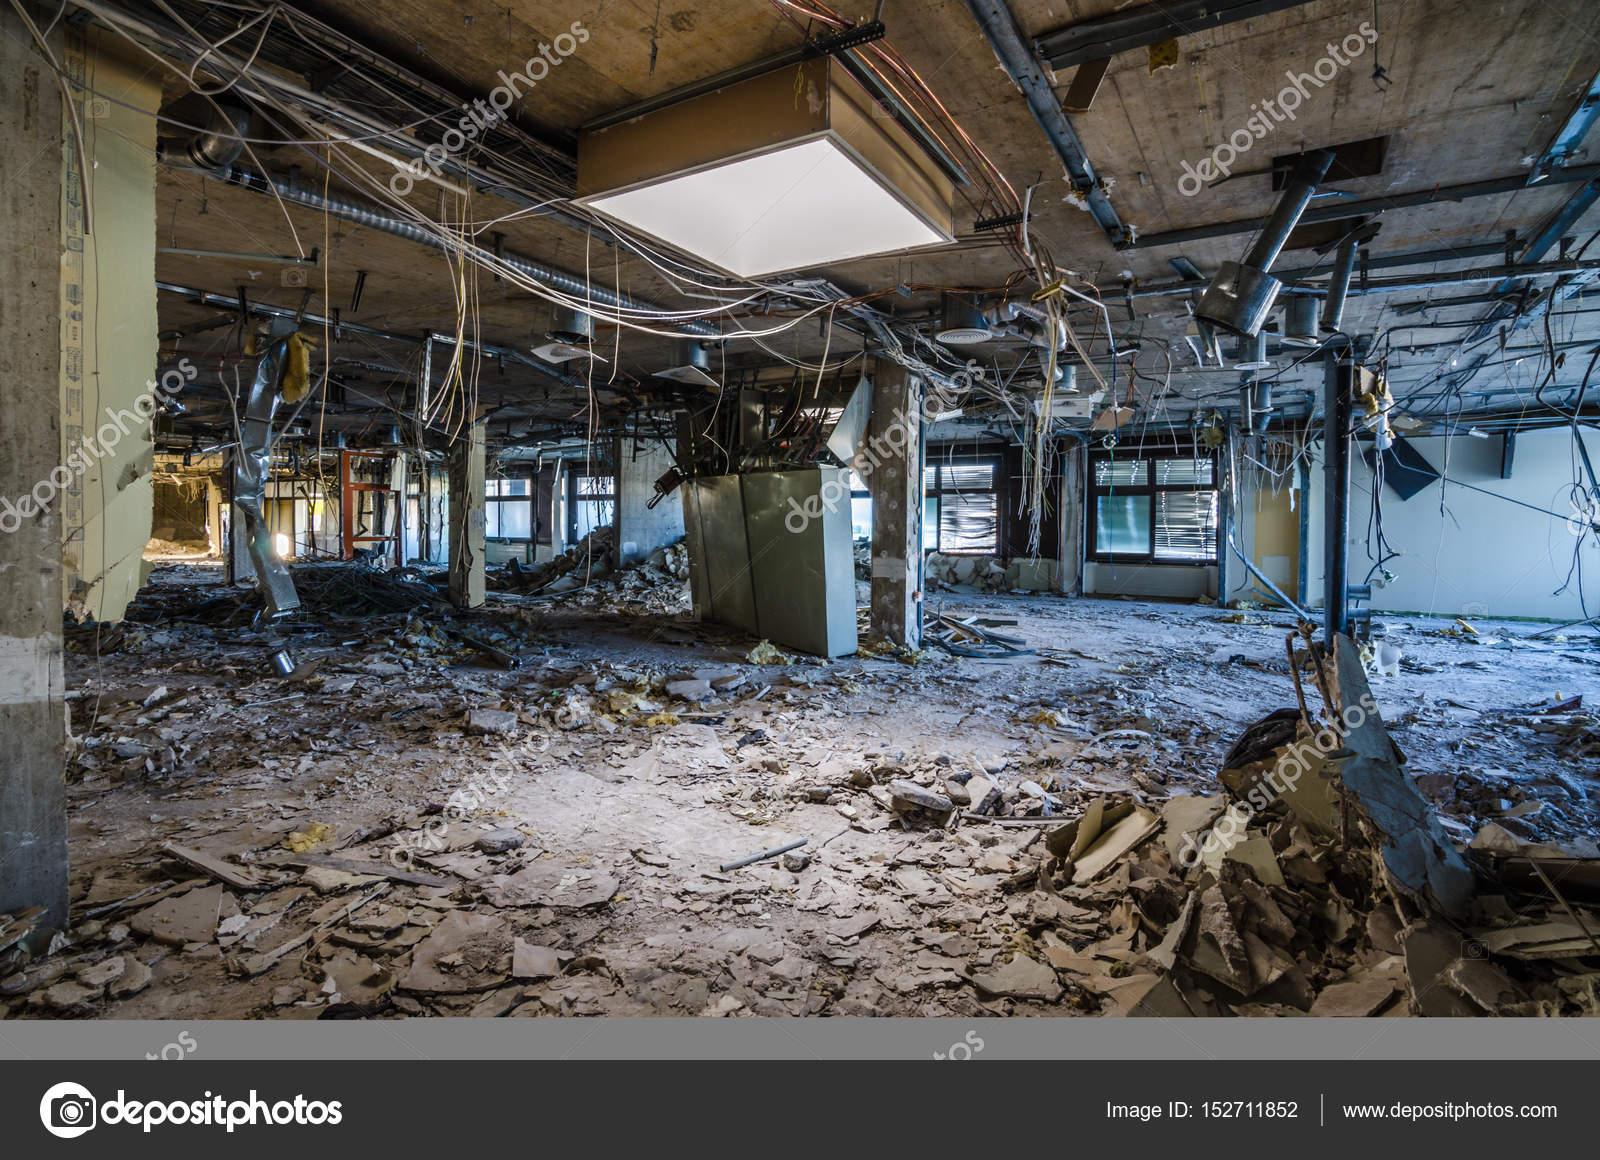 Fußboden Im Krankenhaus ~ Fußboden in verlassenen krankenhaus u2014 stockfoto © thomaseder #152711852